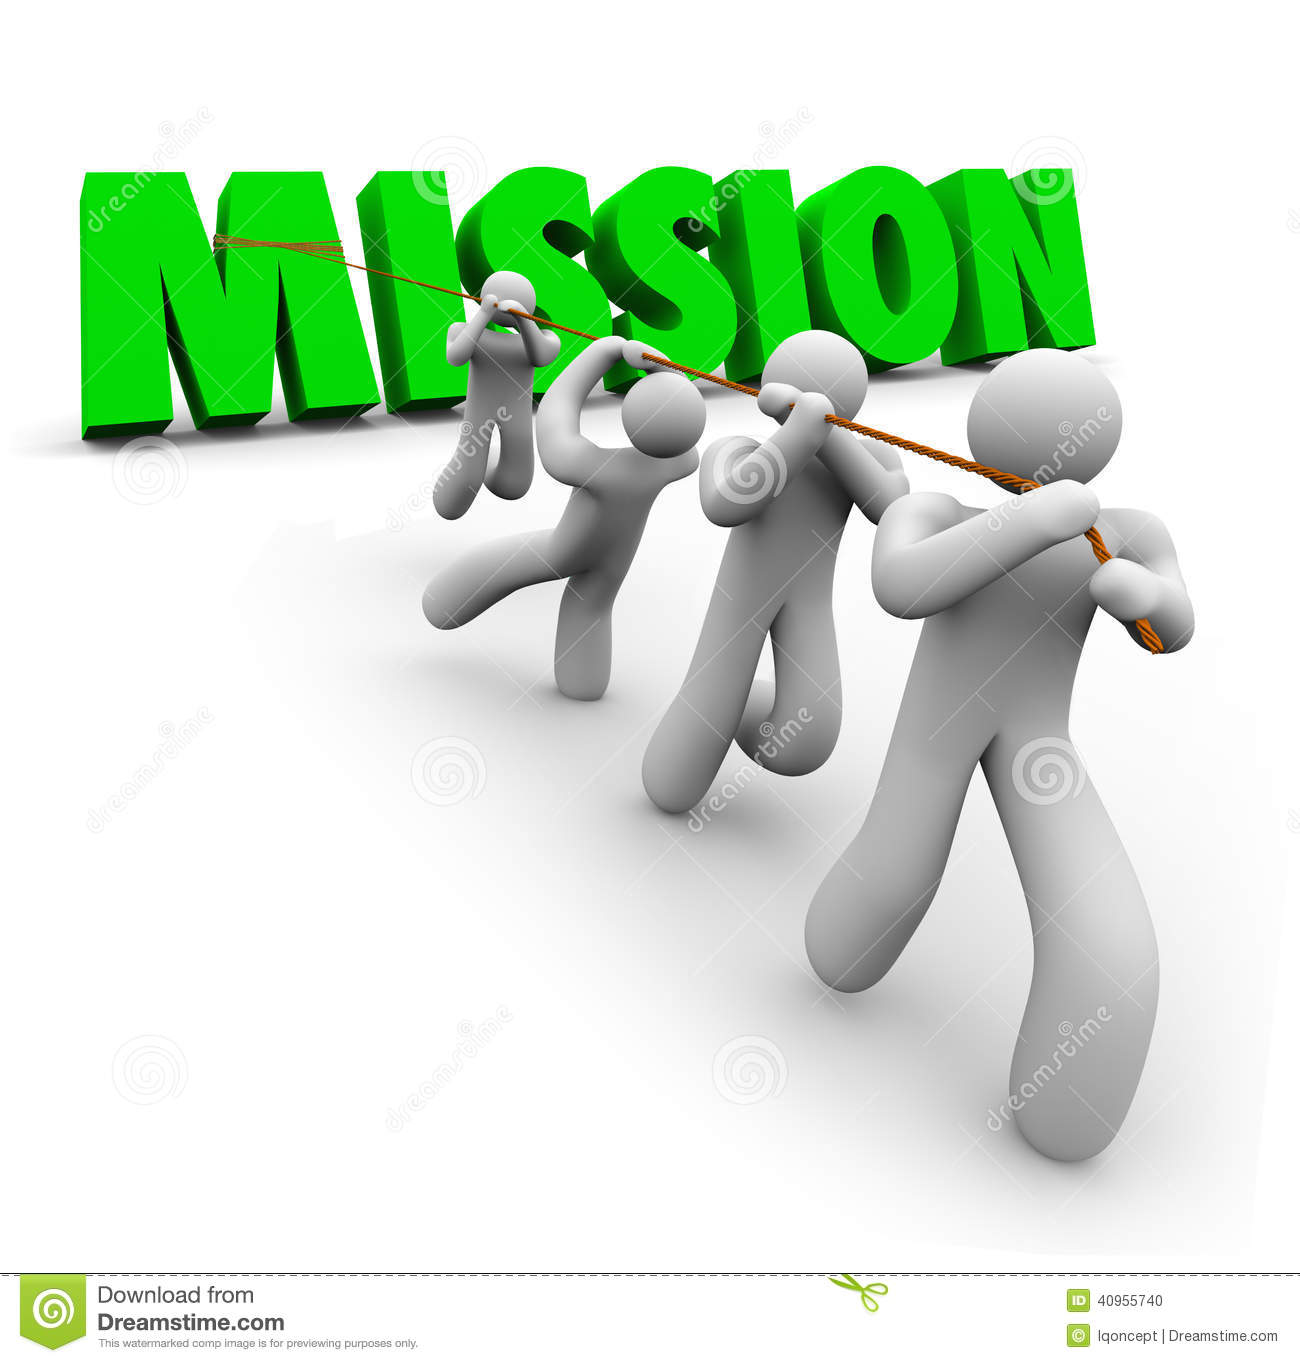 Common goal clipart clip freeuse download Goals clipart common goal - 93 transparent clip arts, images and ... clip freeuse download